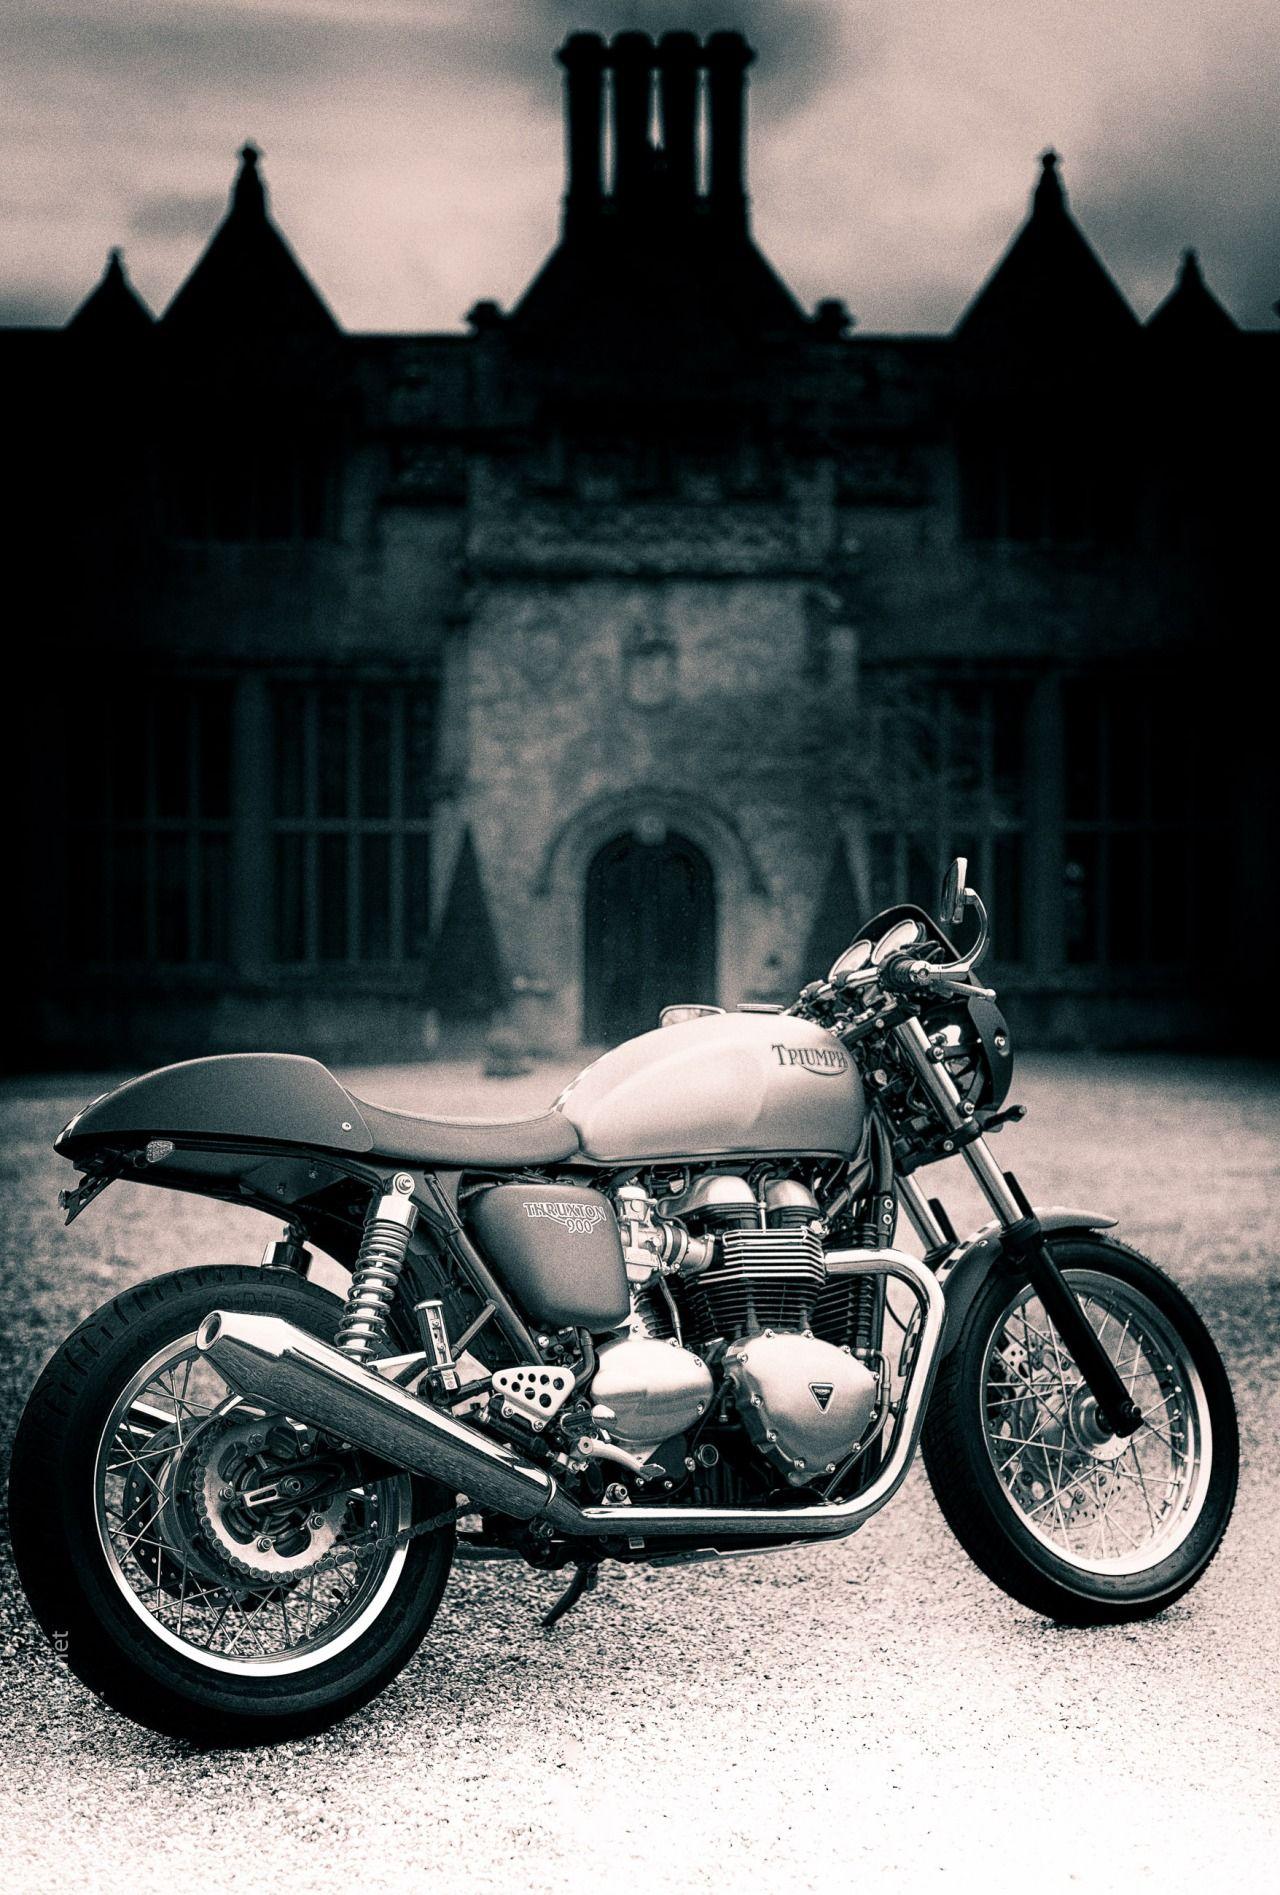 #motor #bike #triumph #motorcycle